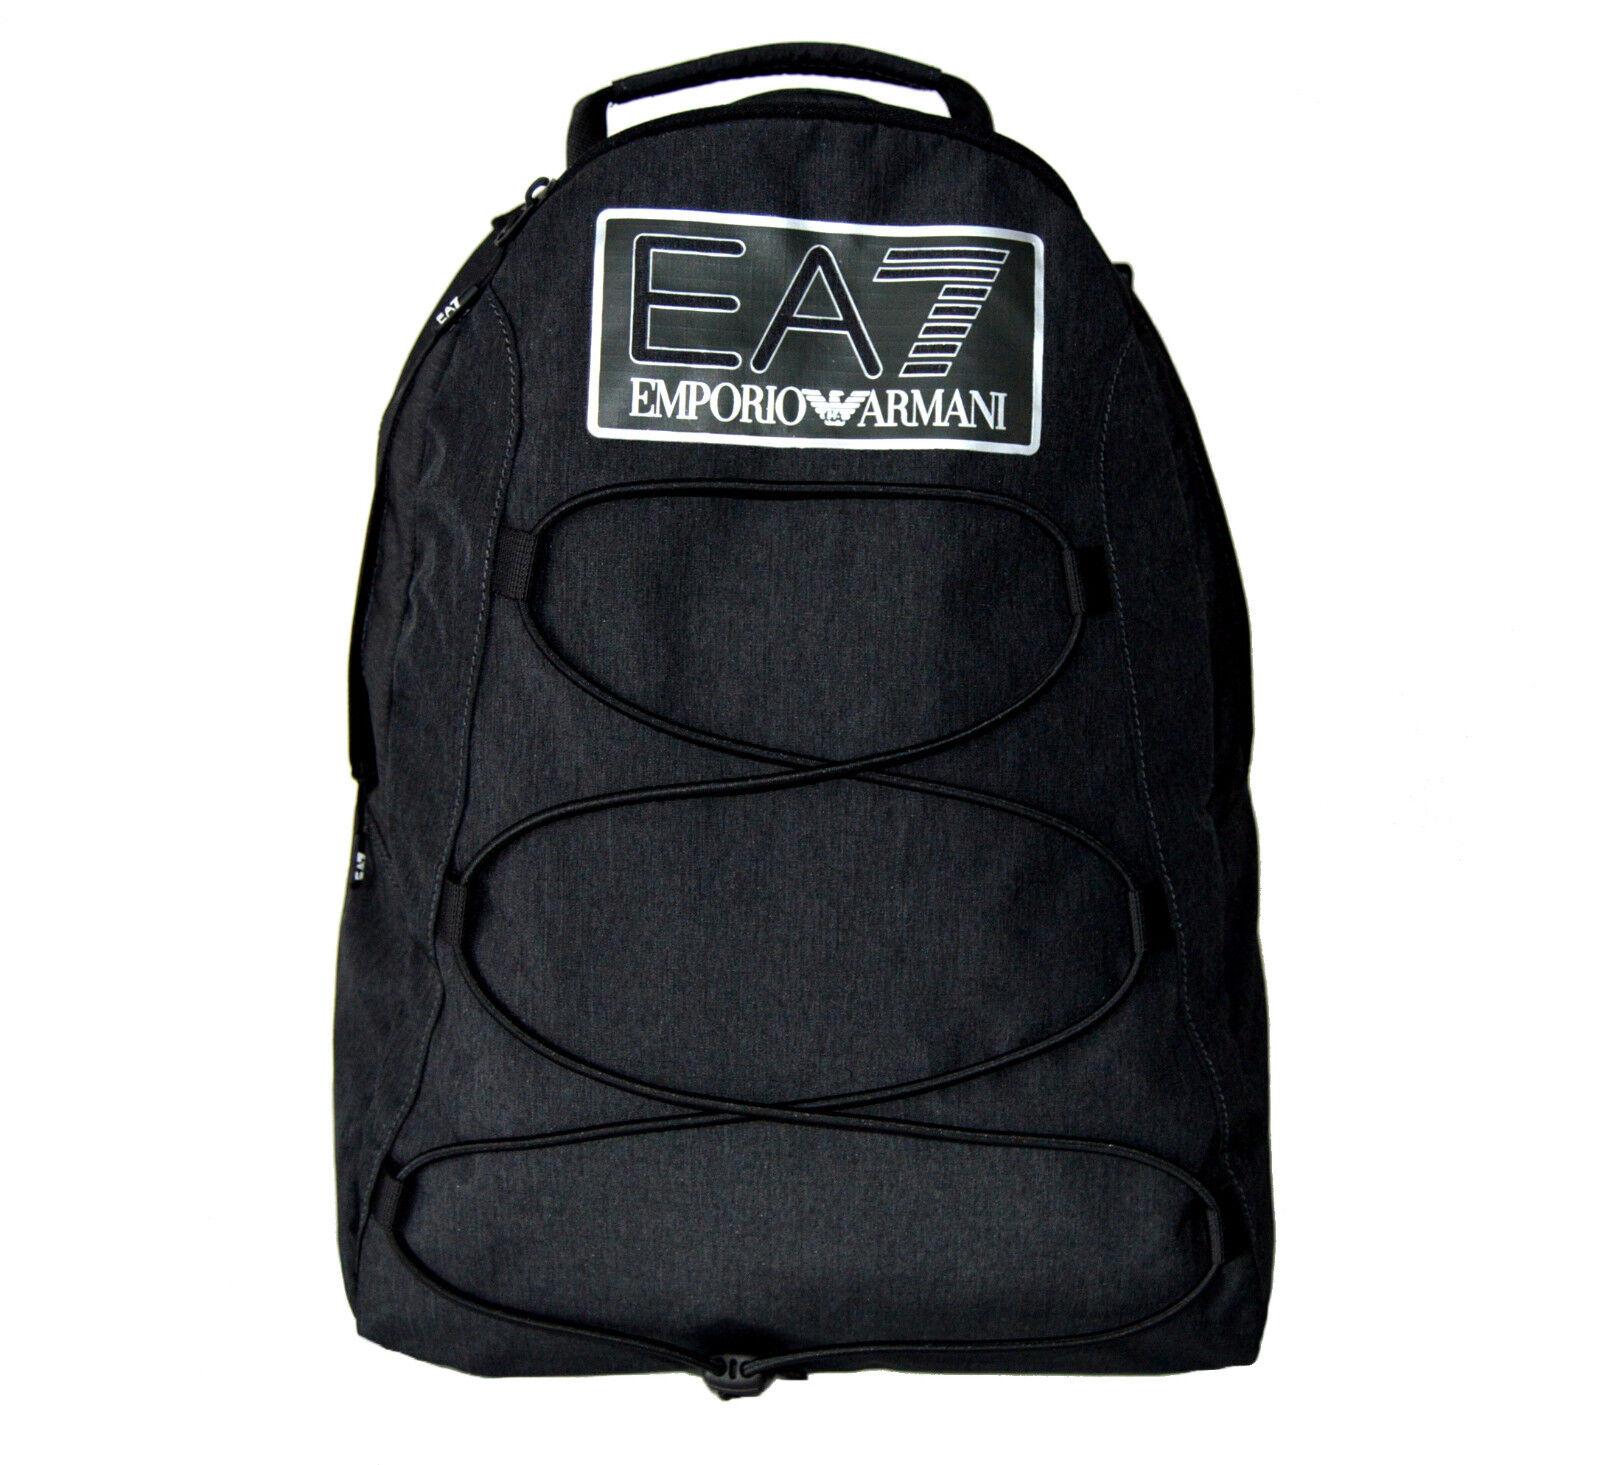 cf17f7fa4bf42 EMPORIO ARMANI EA7 Rucksack Tagesrucksack Backpack Laptopfach ...